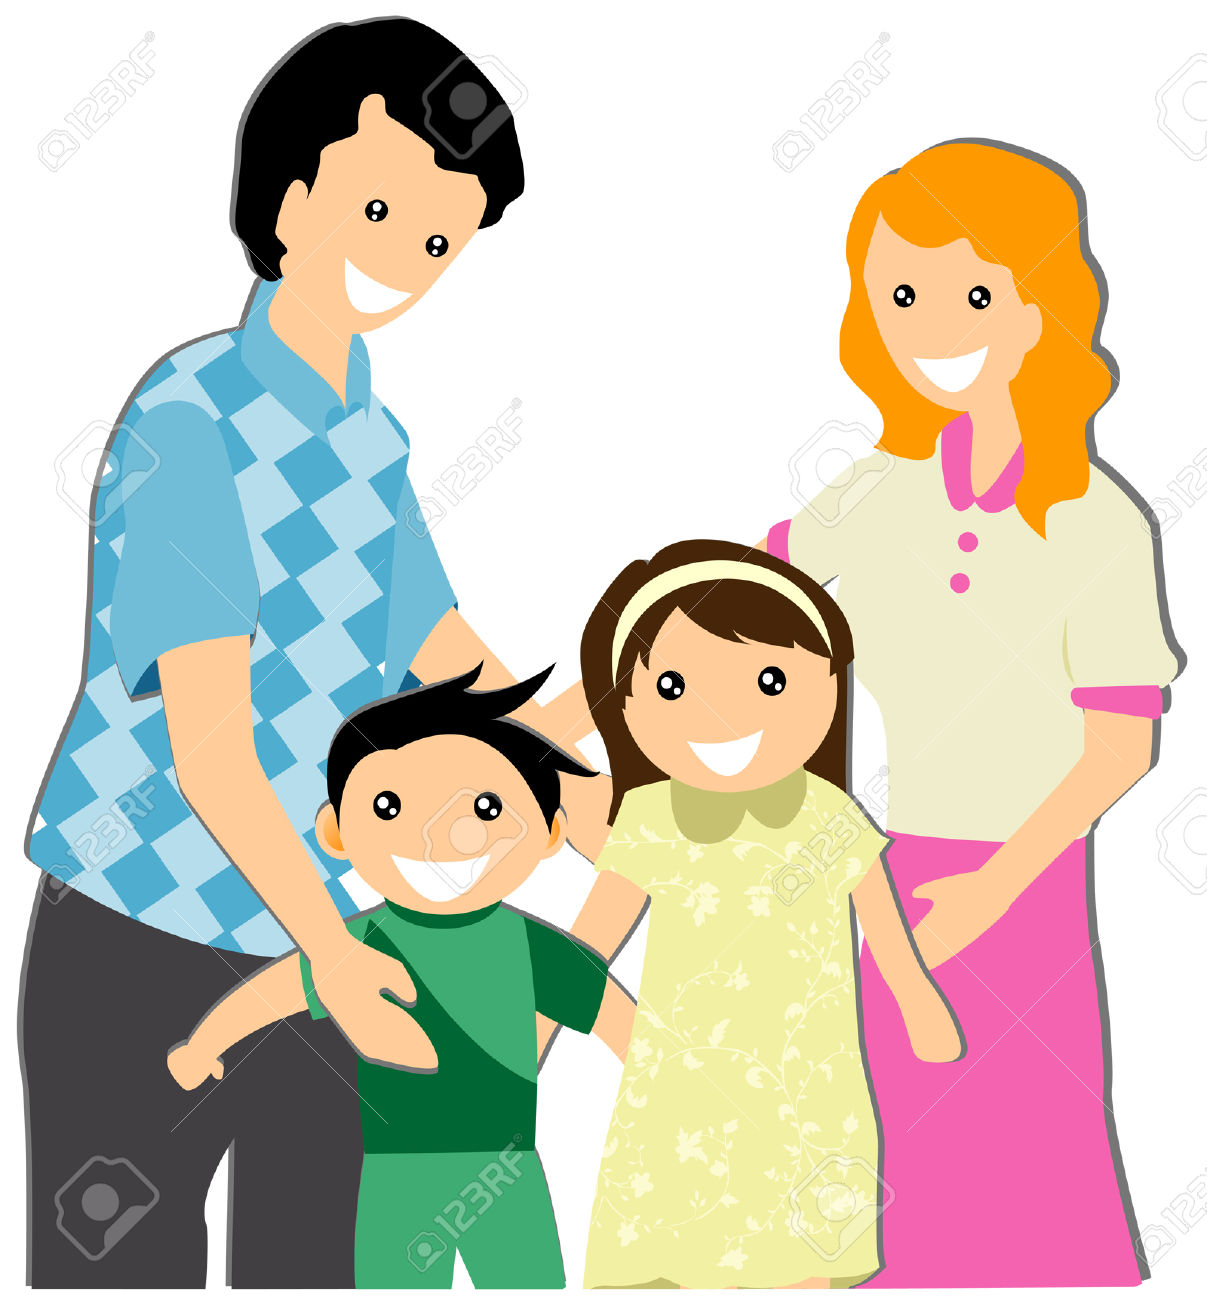 1207x1300 Hug Clipart Family Hug